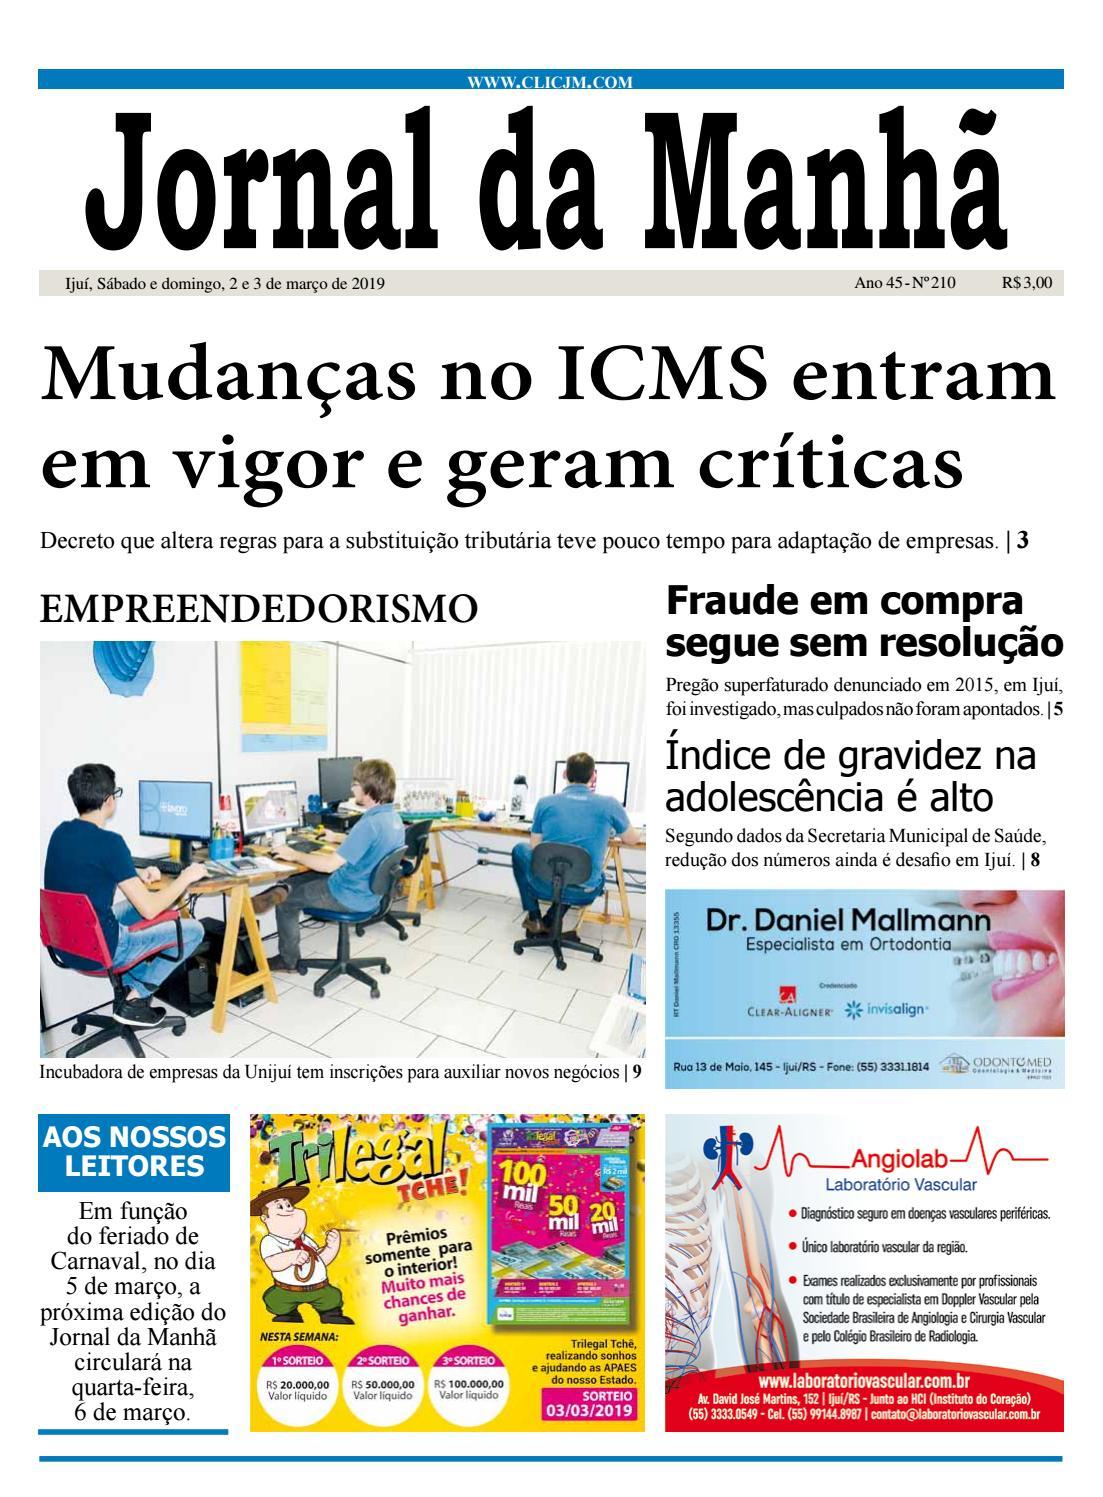 921b47c2c49 Jornal da Manhã - Sábado - 02-03-2019 by clicjm - issuu